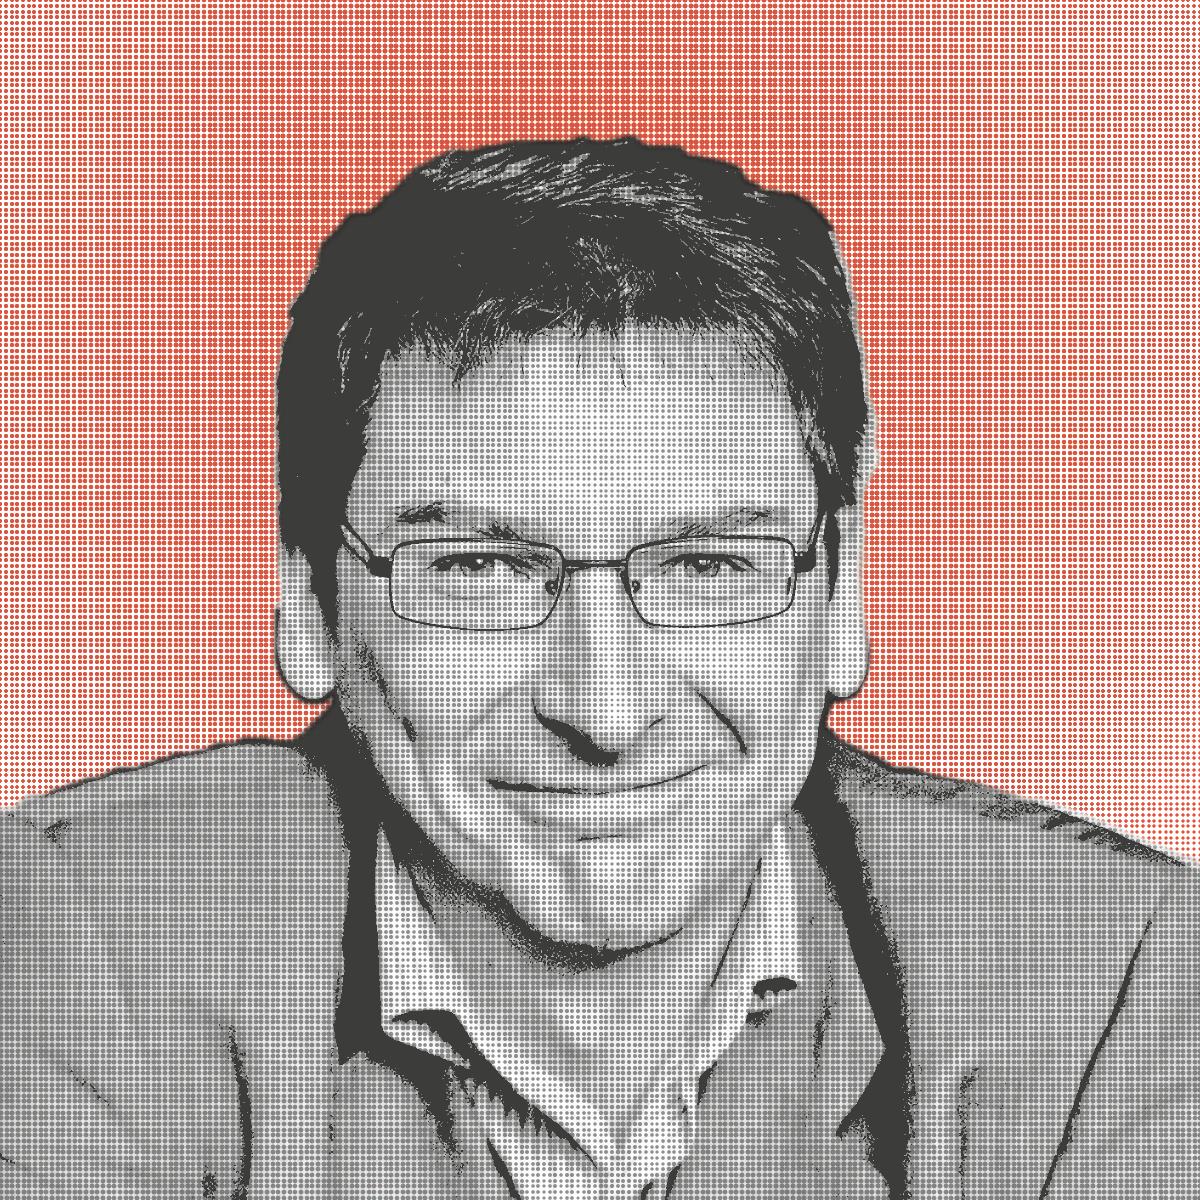 Aleksander Kaczorowski